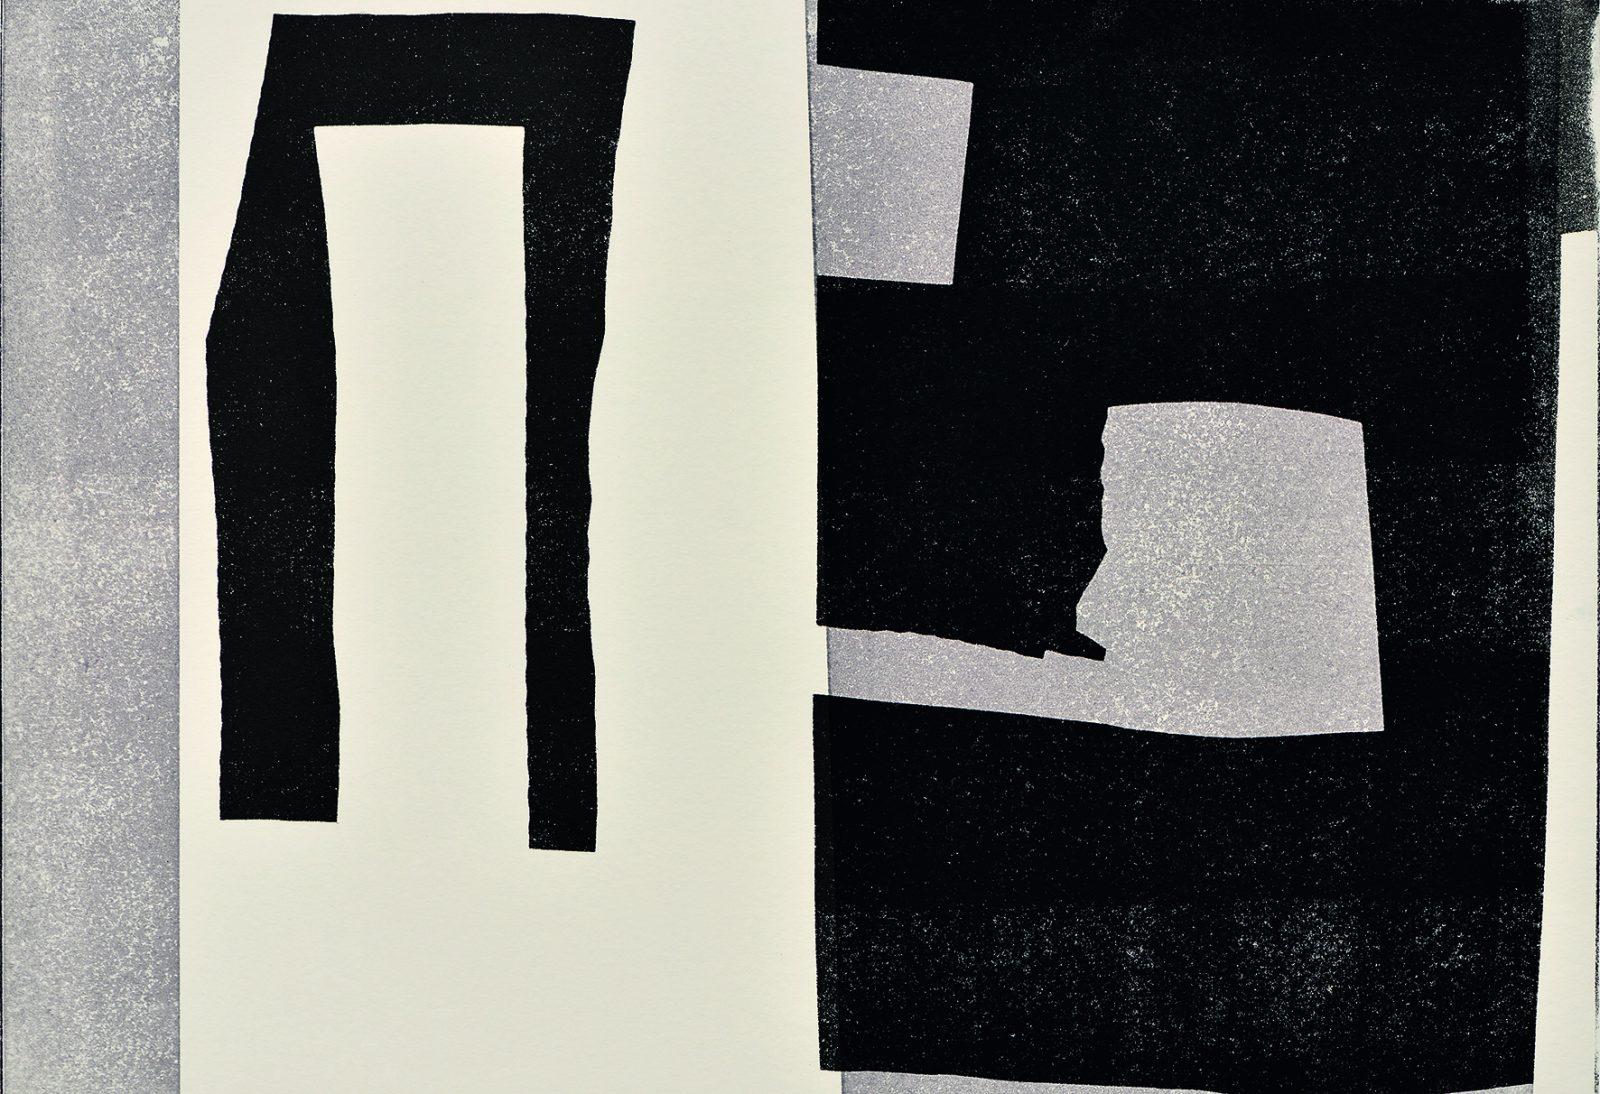 NÖ Waldviertel Galerie Kunst - blaugelbezwettl: Andreas Ortag